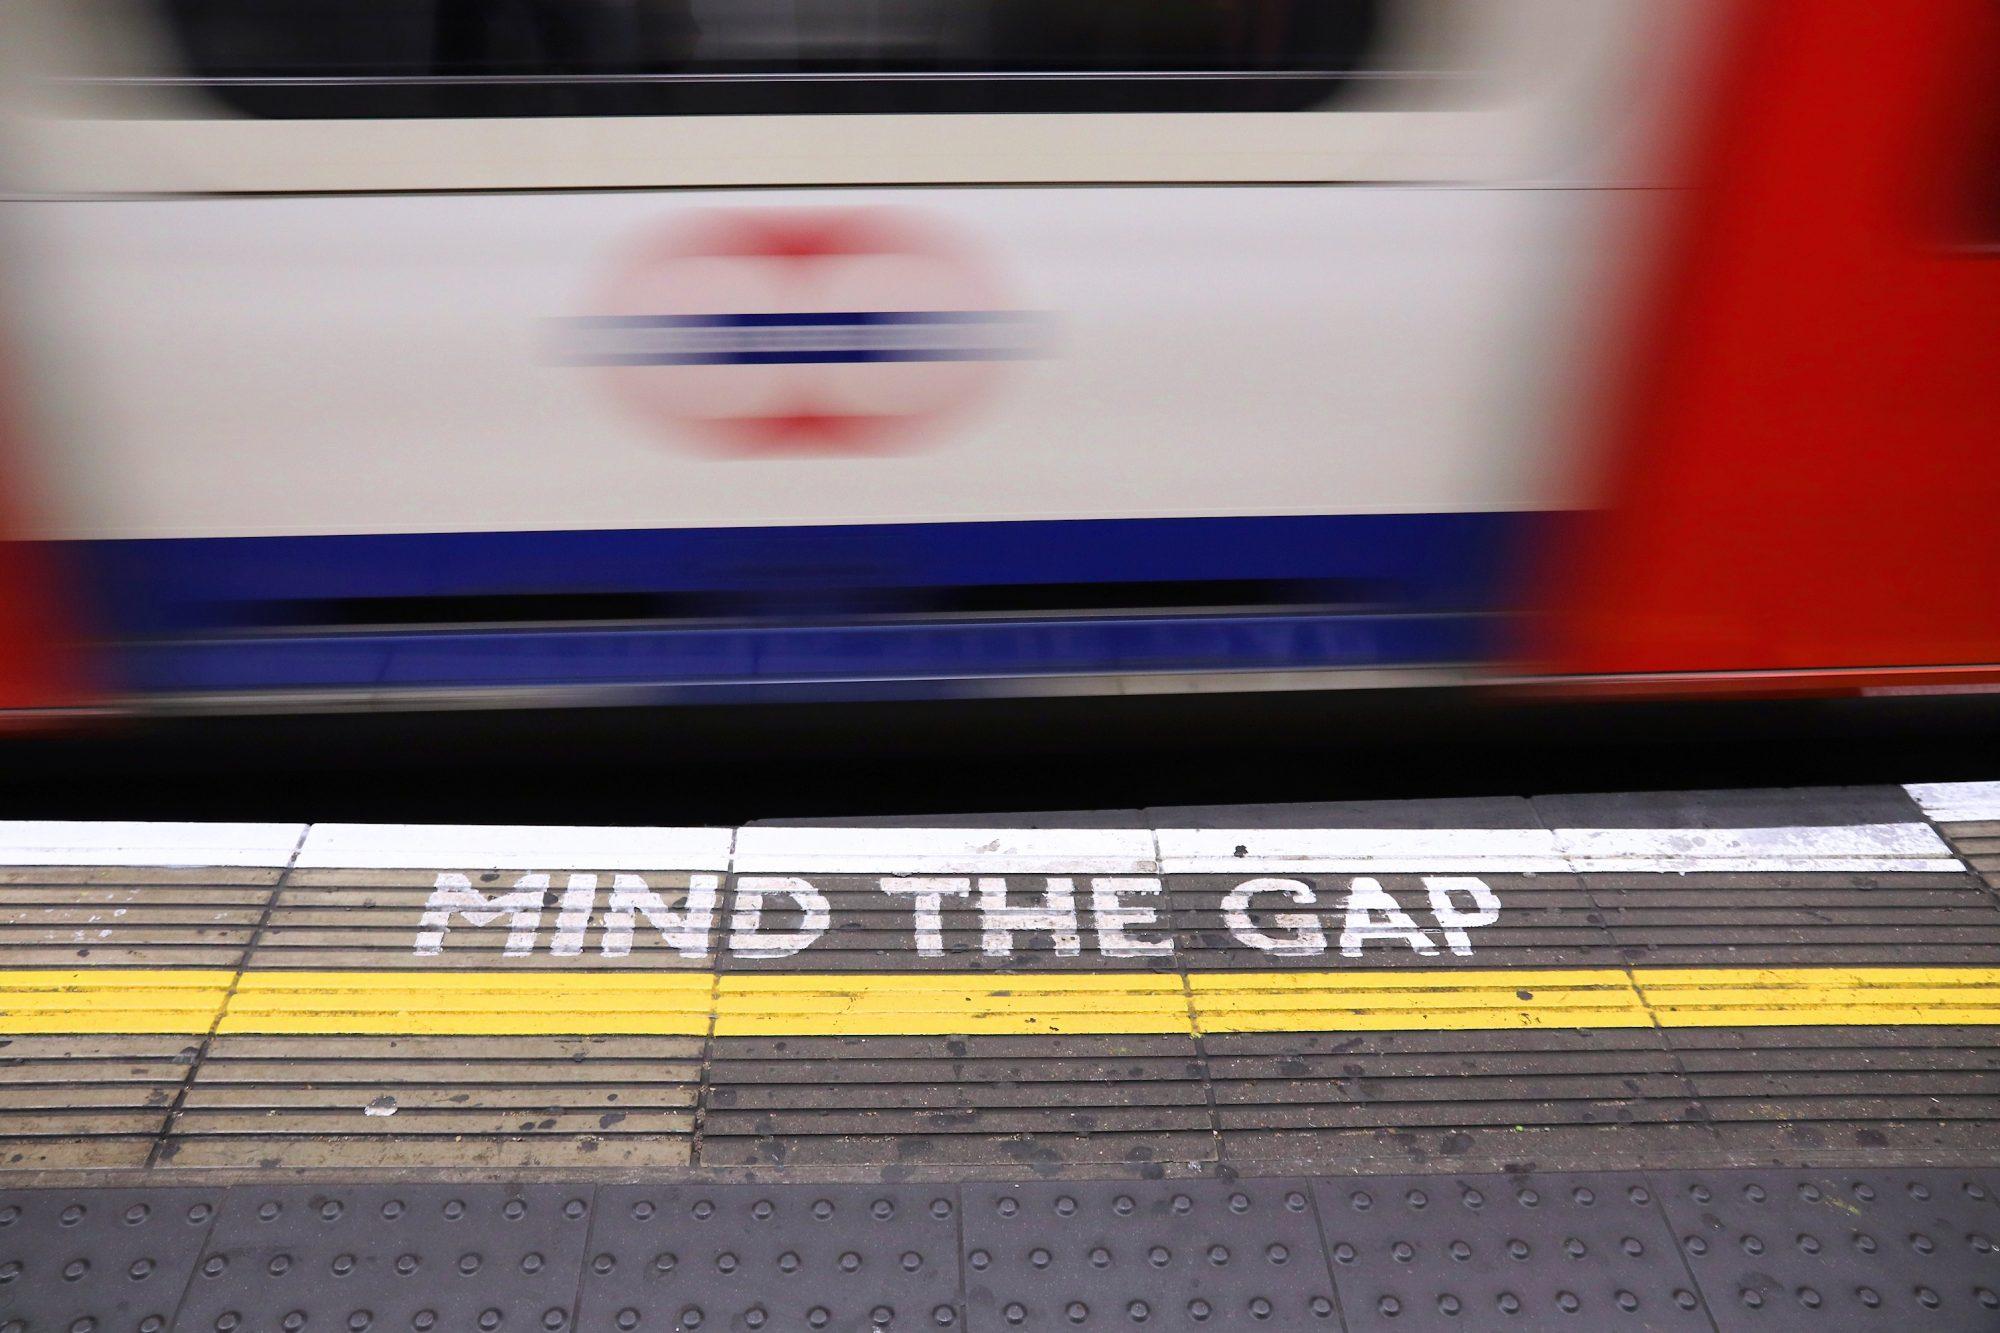 Minding the Gap in Microsoft Teams